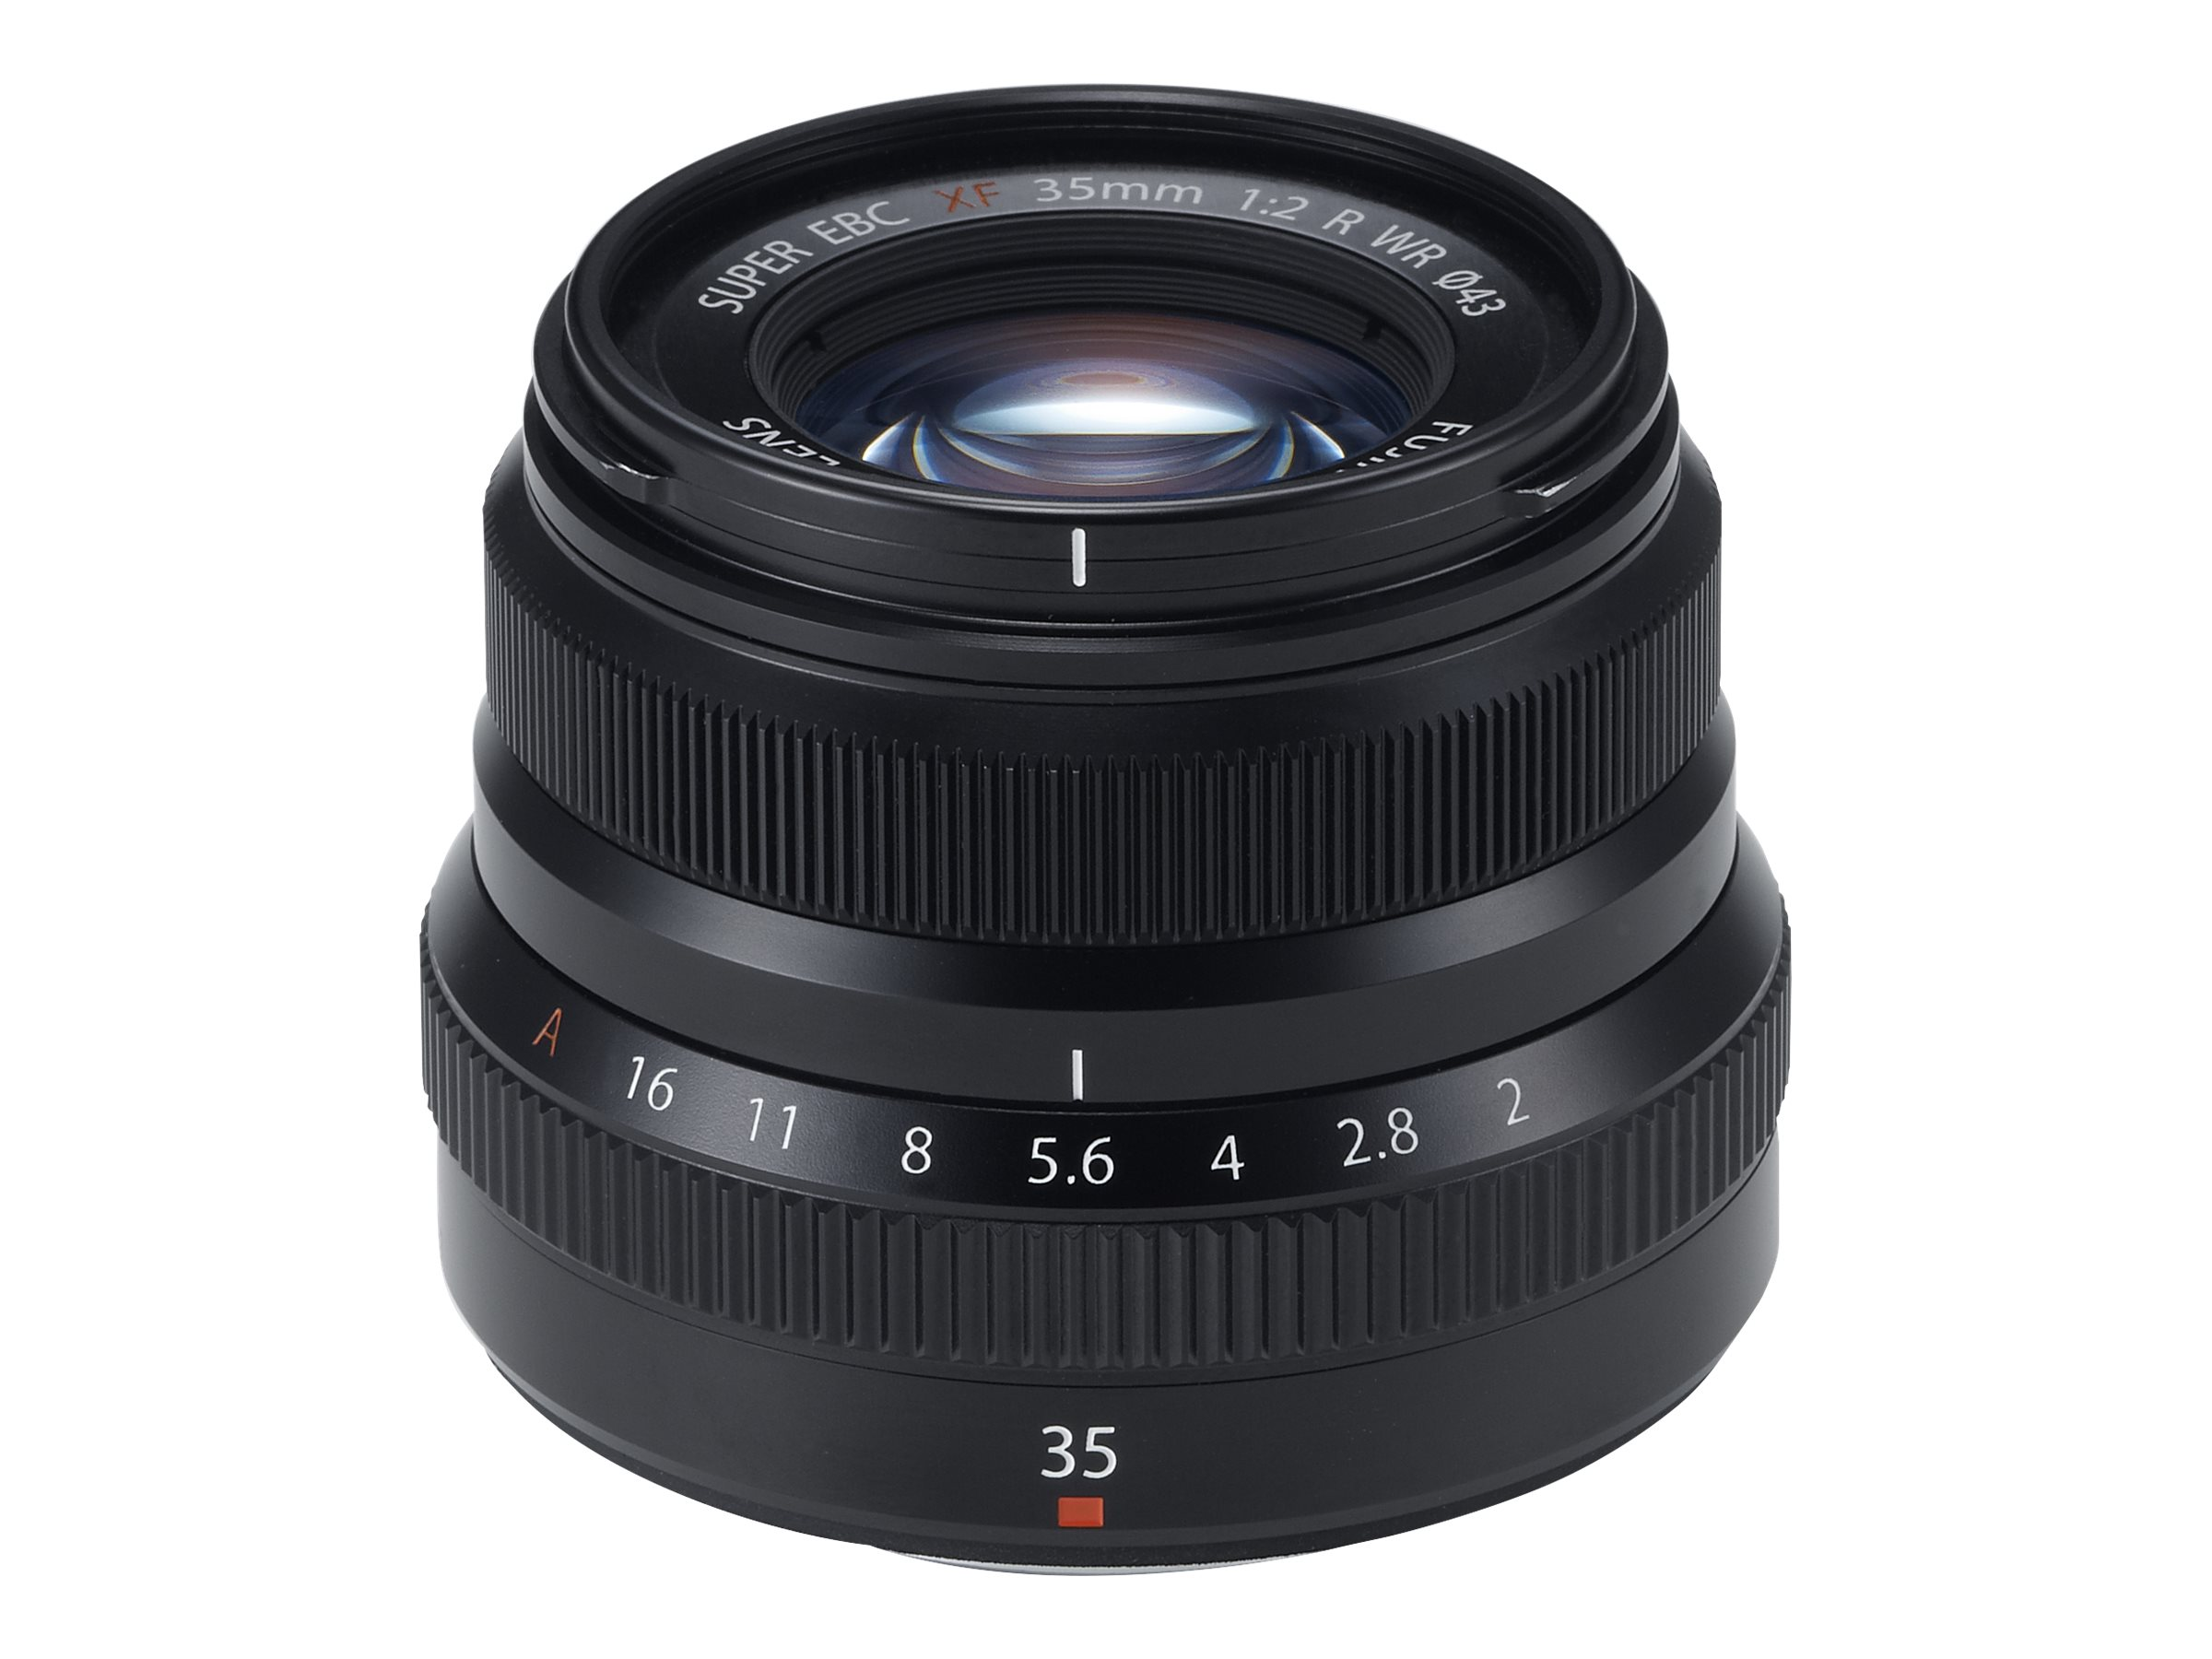 Fujinon XF - Objektiv - 35 mm - f/2.0 R WR - Fujifilm X Mount - für X Series X-A10, X-A3, X-A5, X-E3, X-H1, X-T100, X-T3, X-T30